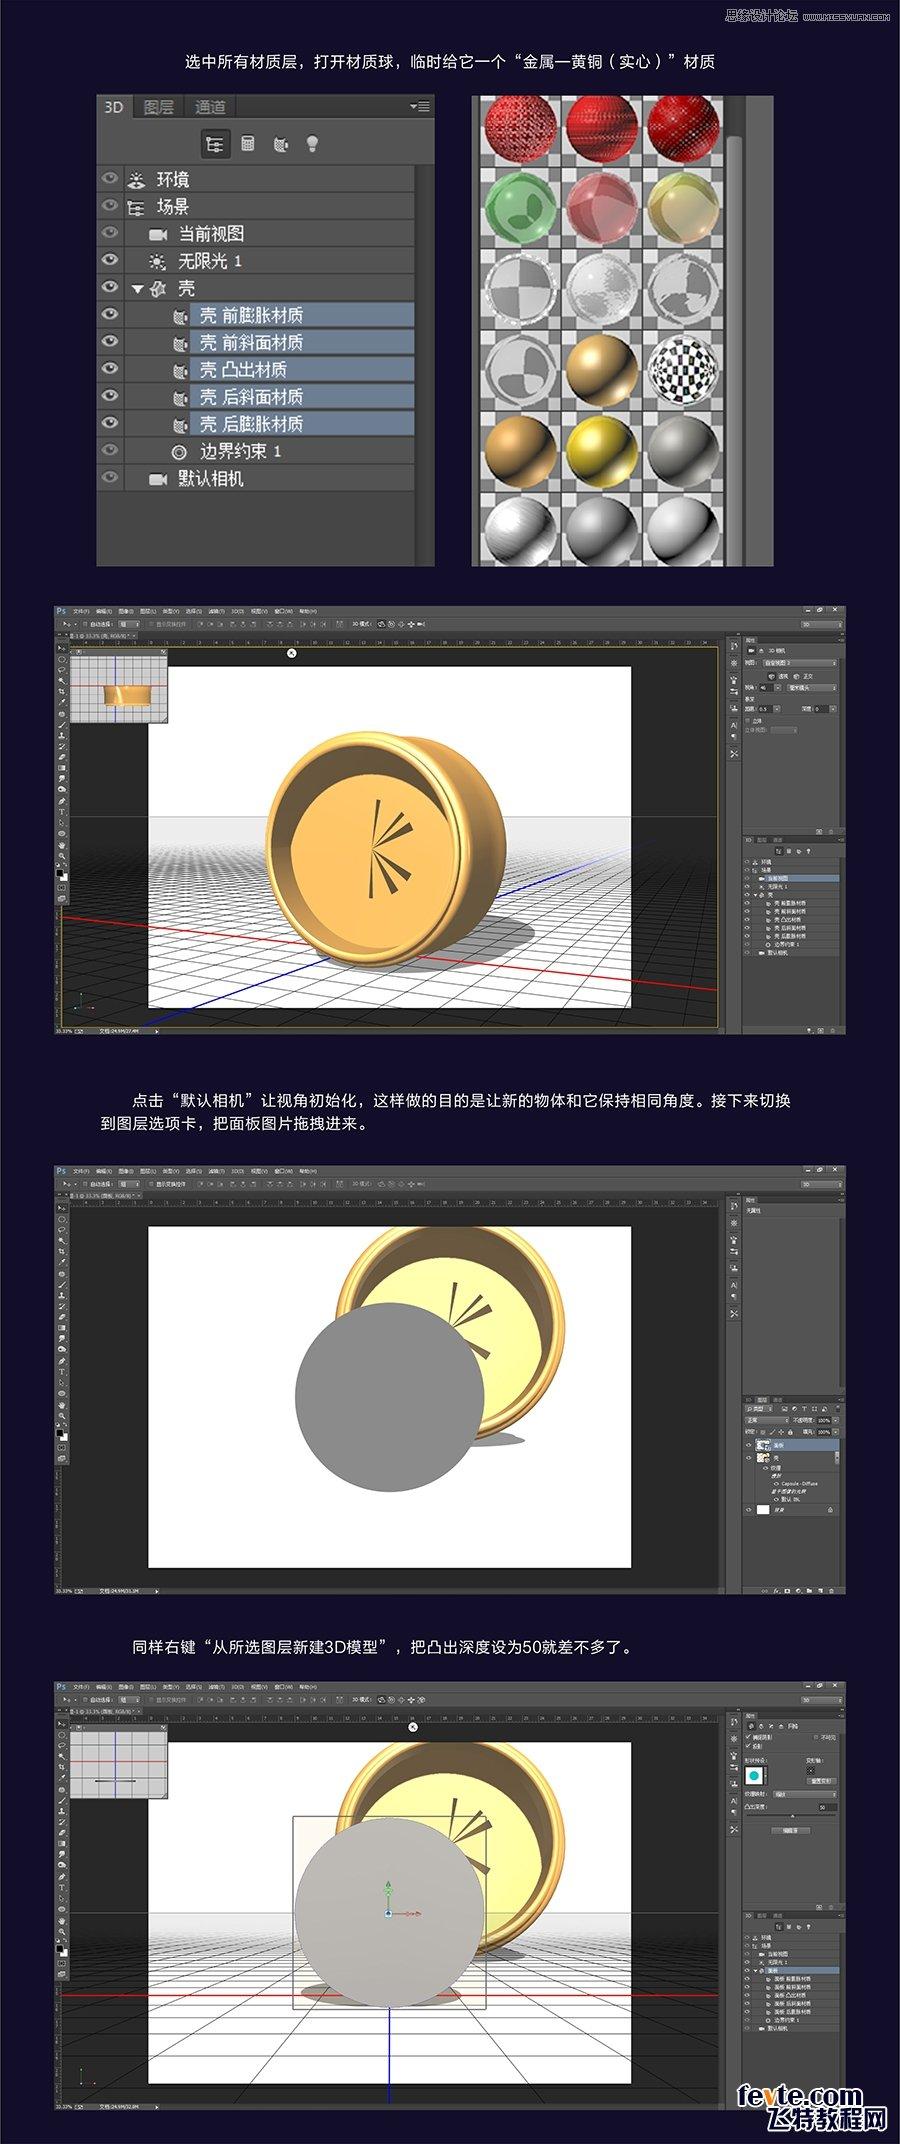 來源自愛設計http://www.qdvhqw.live/